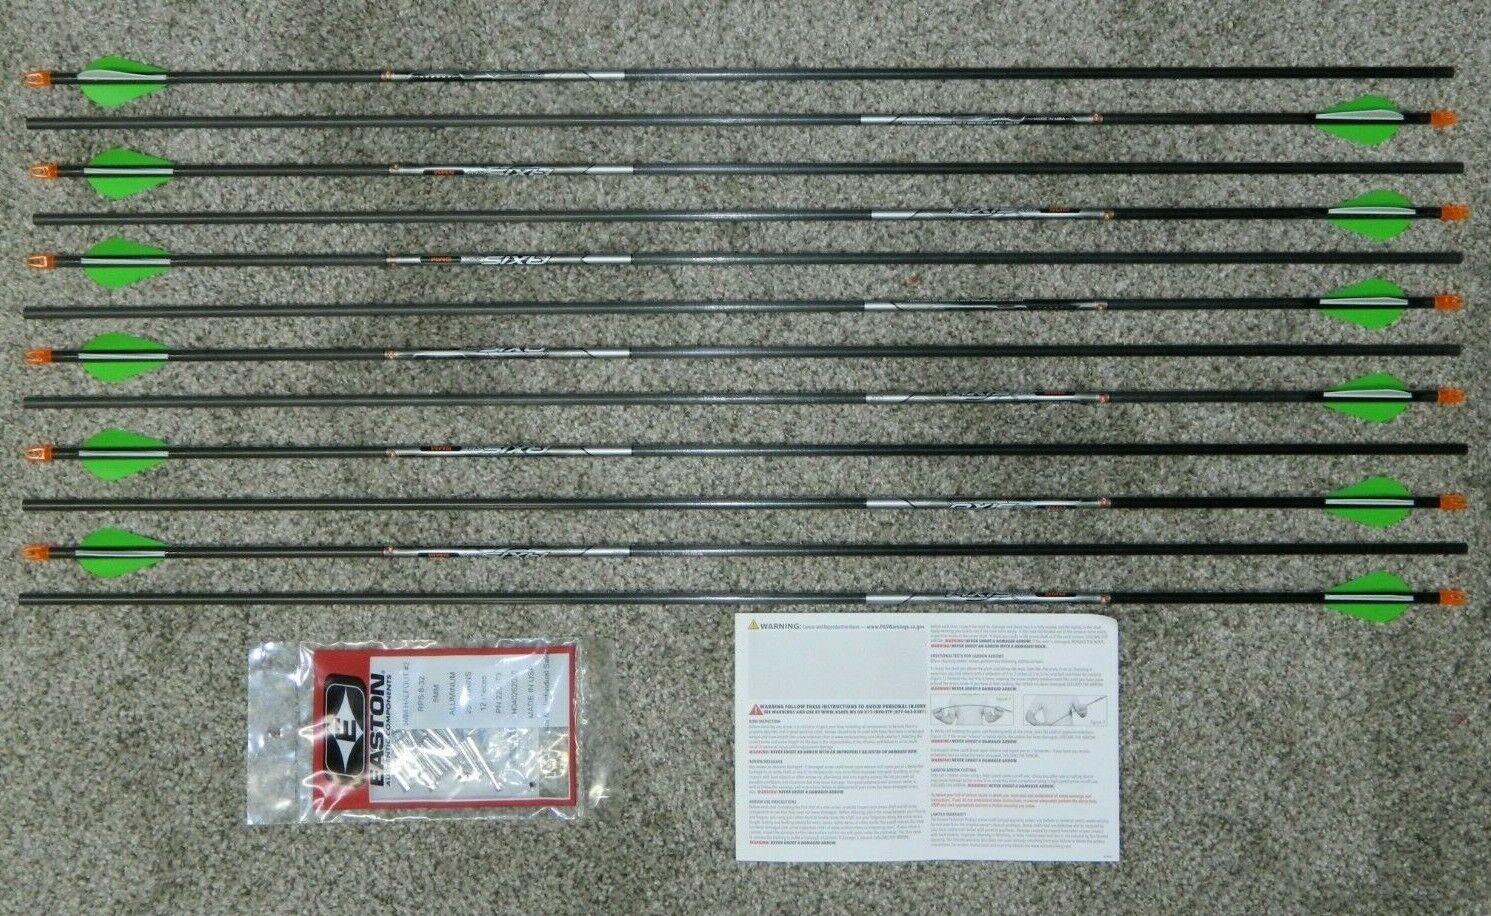 New Easton 5MM Axis Small Diameter Carbon 400 Arrows 1 Dozen Shafts